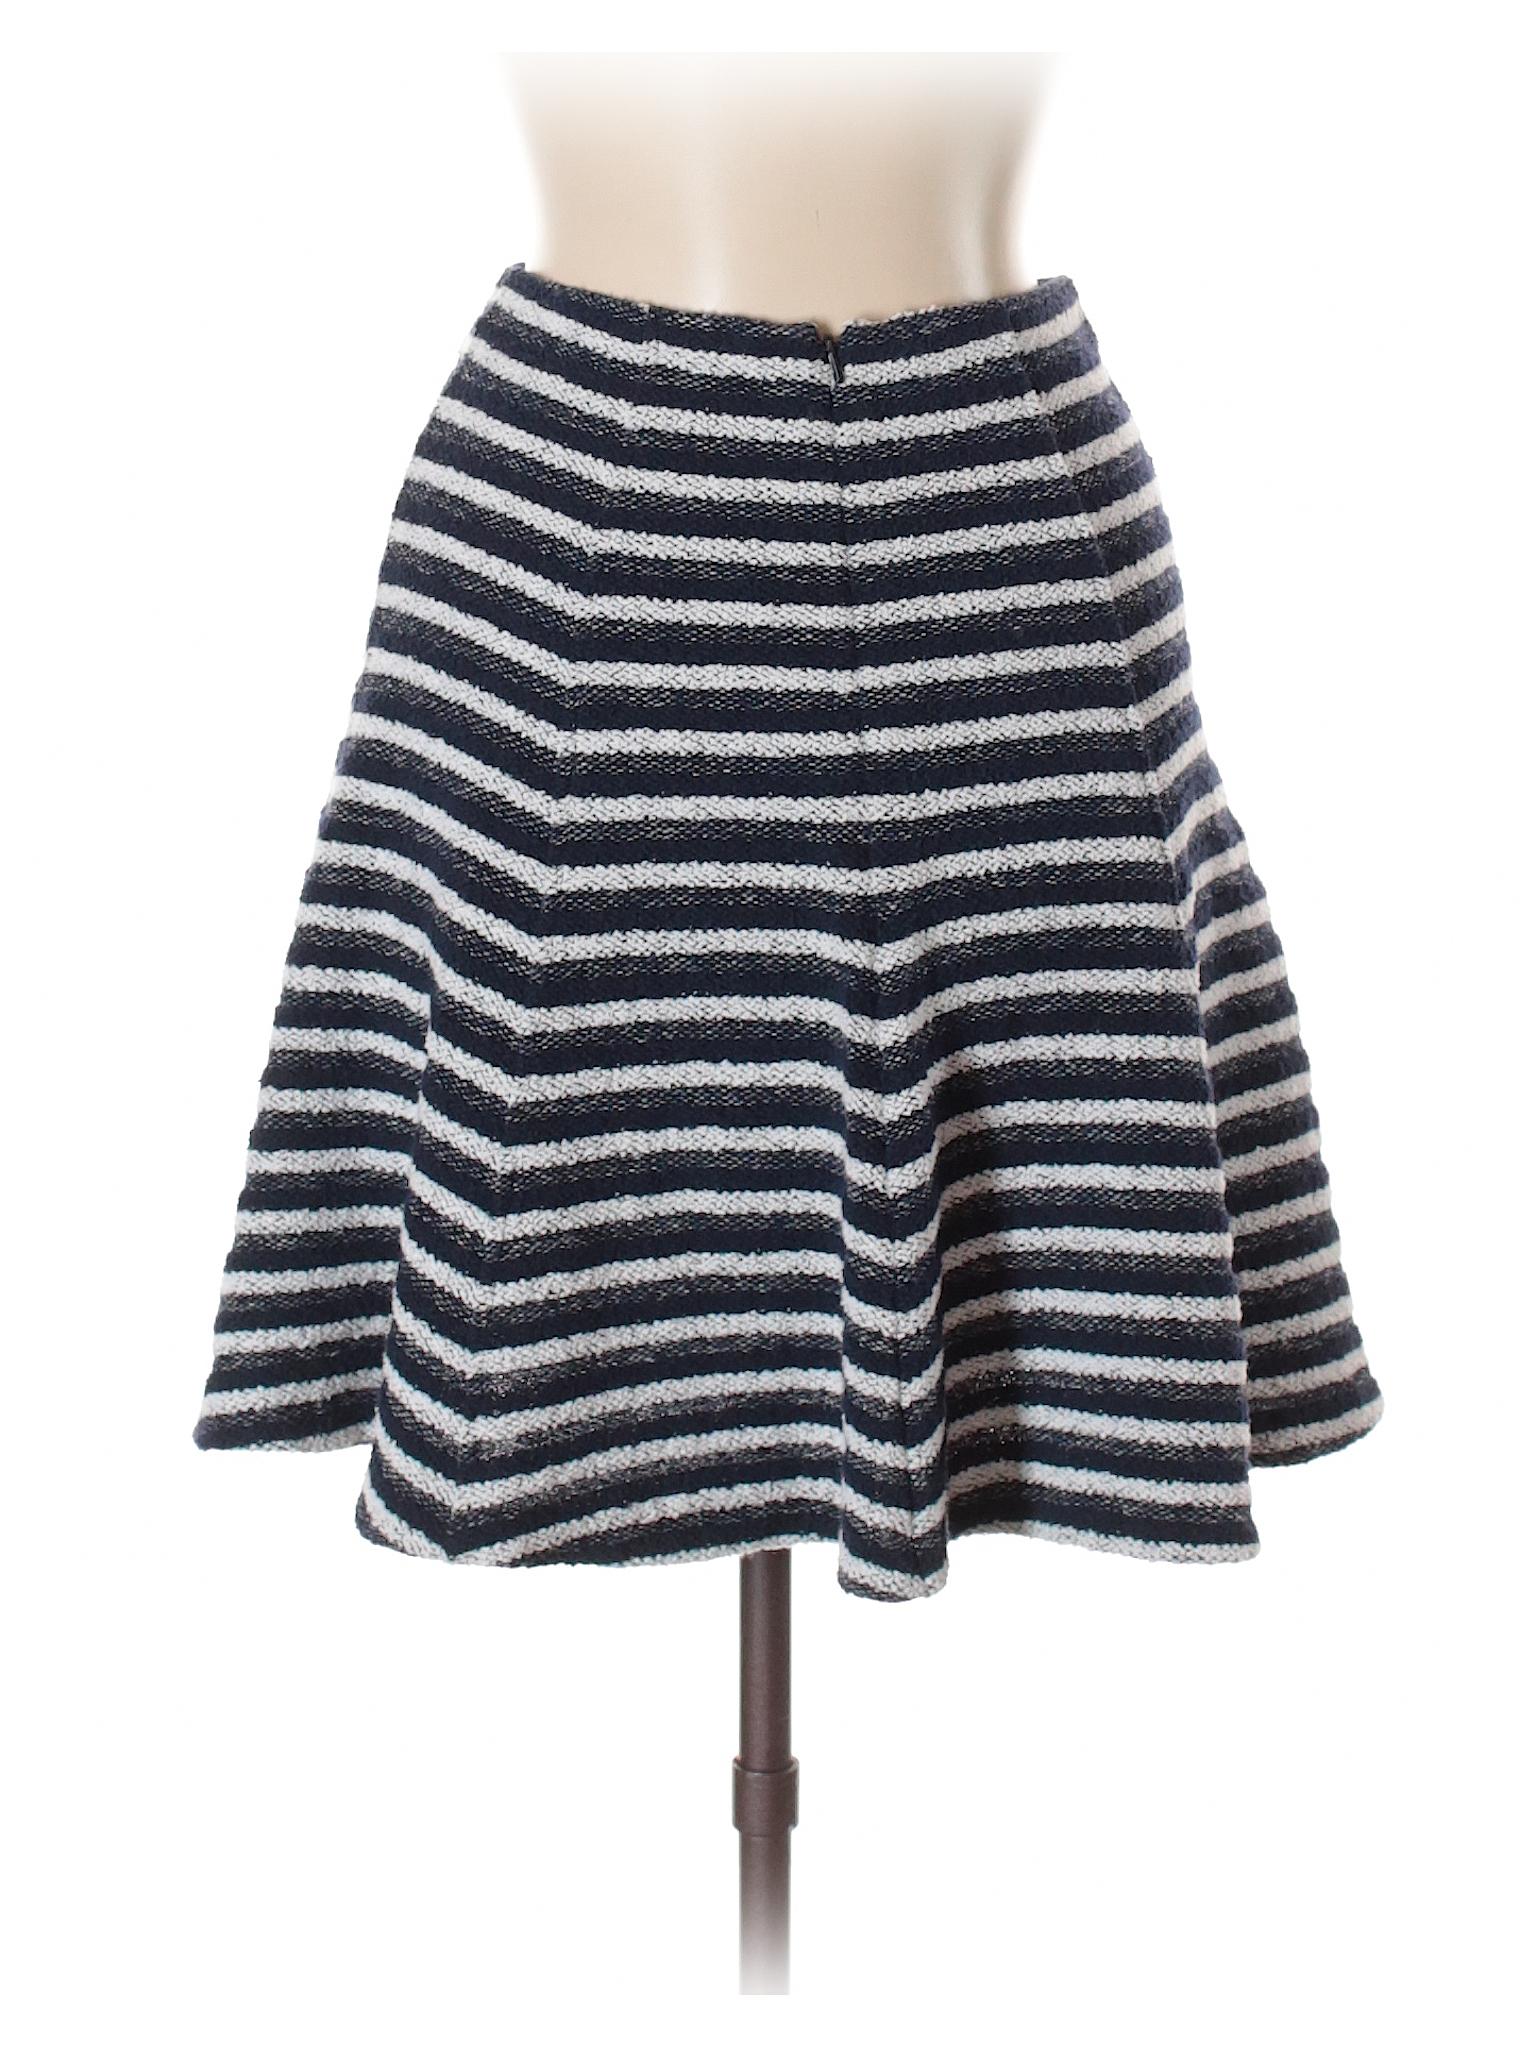 Boutique Casual Casual Boutique Skirt vzBw7dHwqx